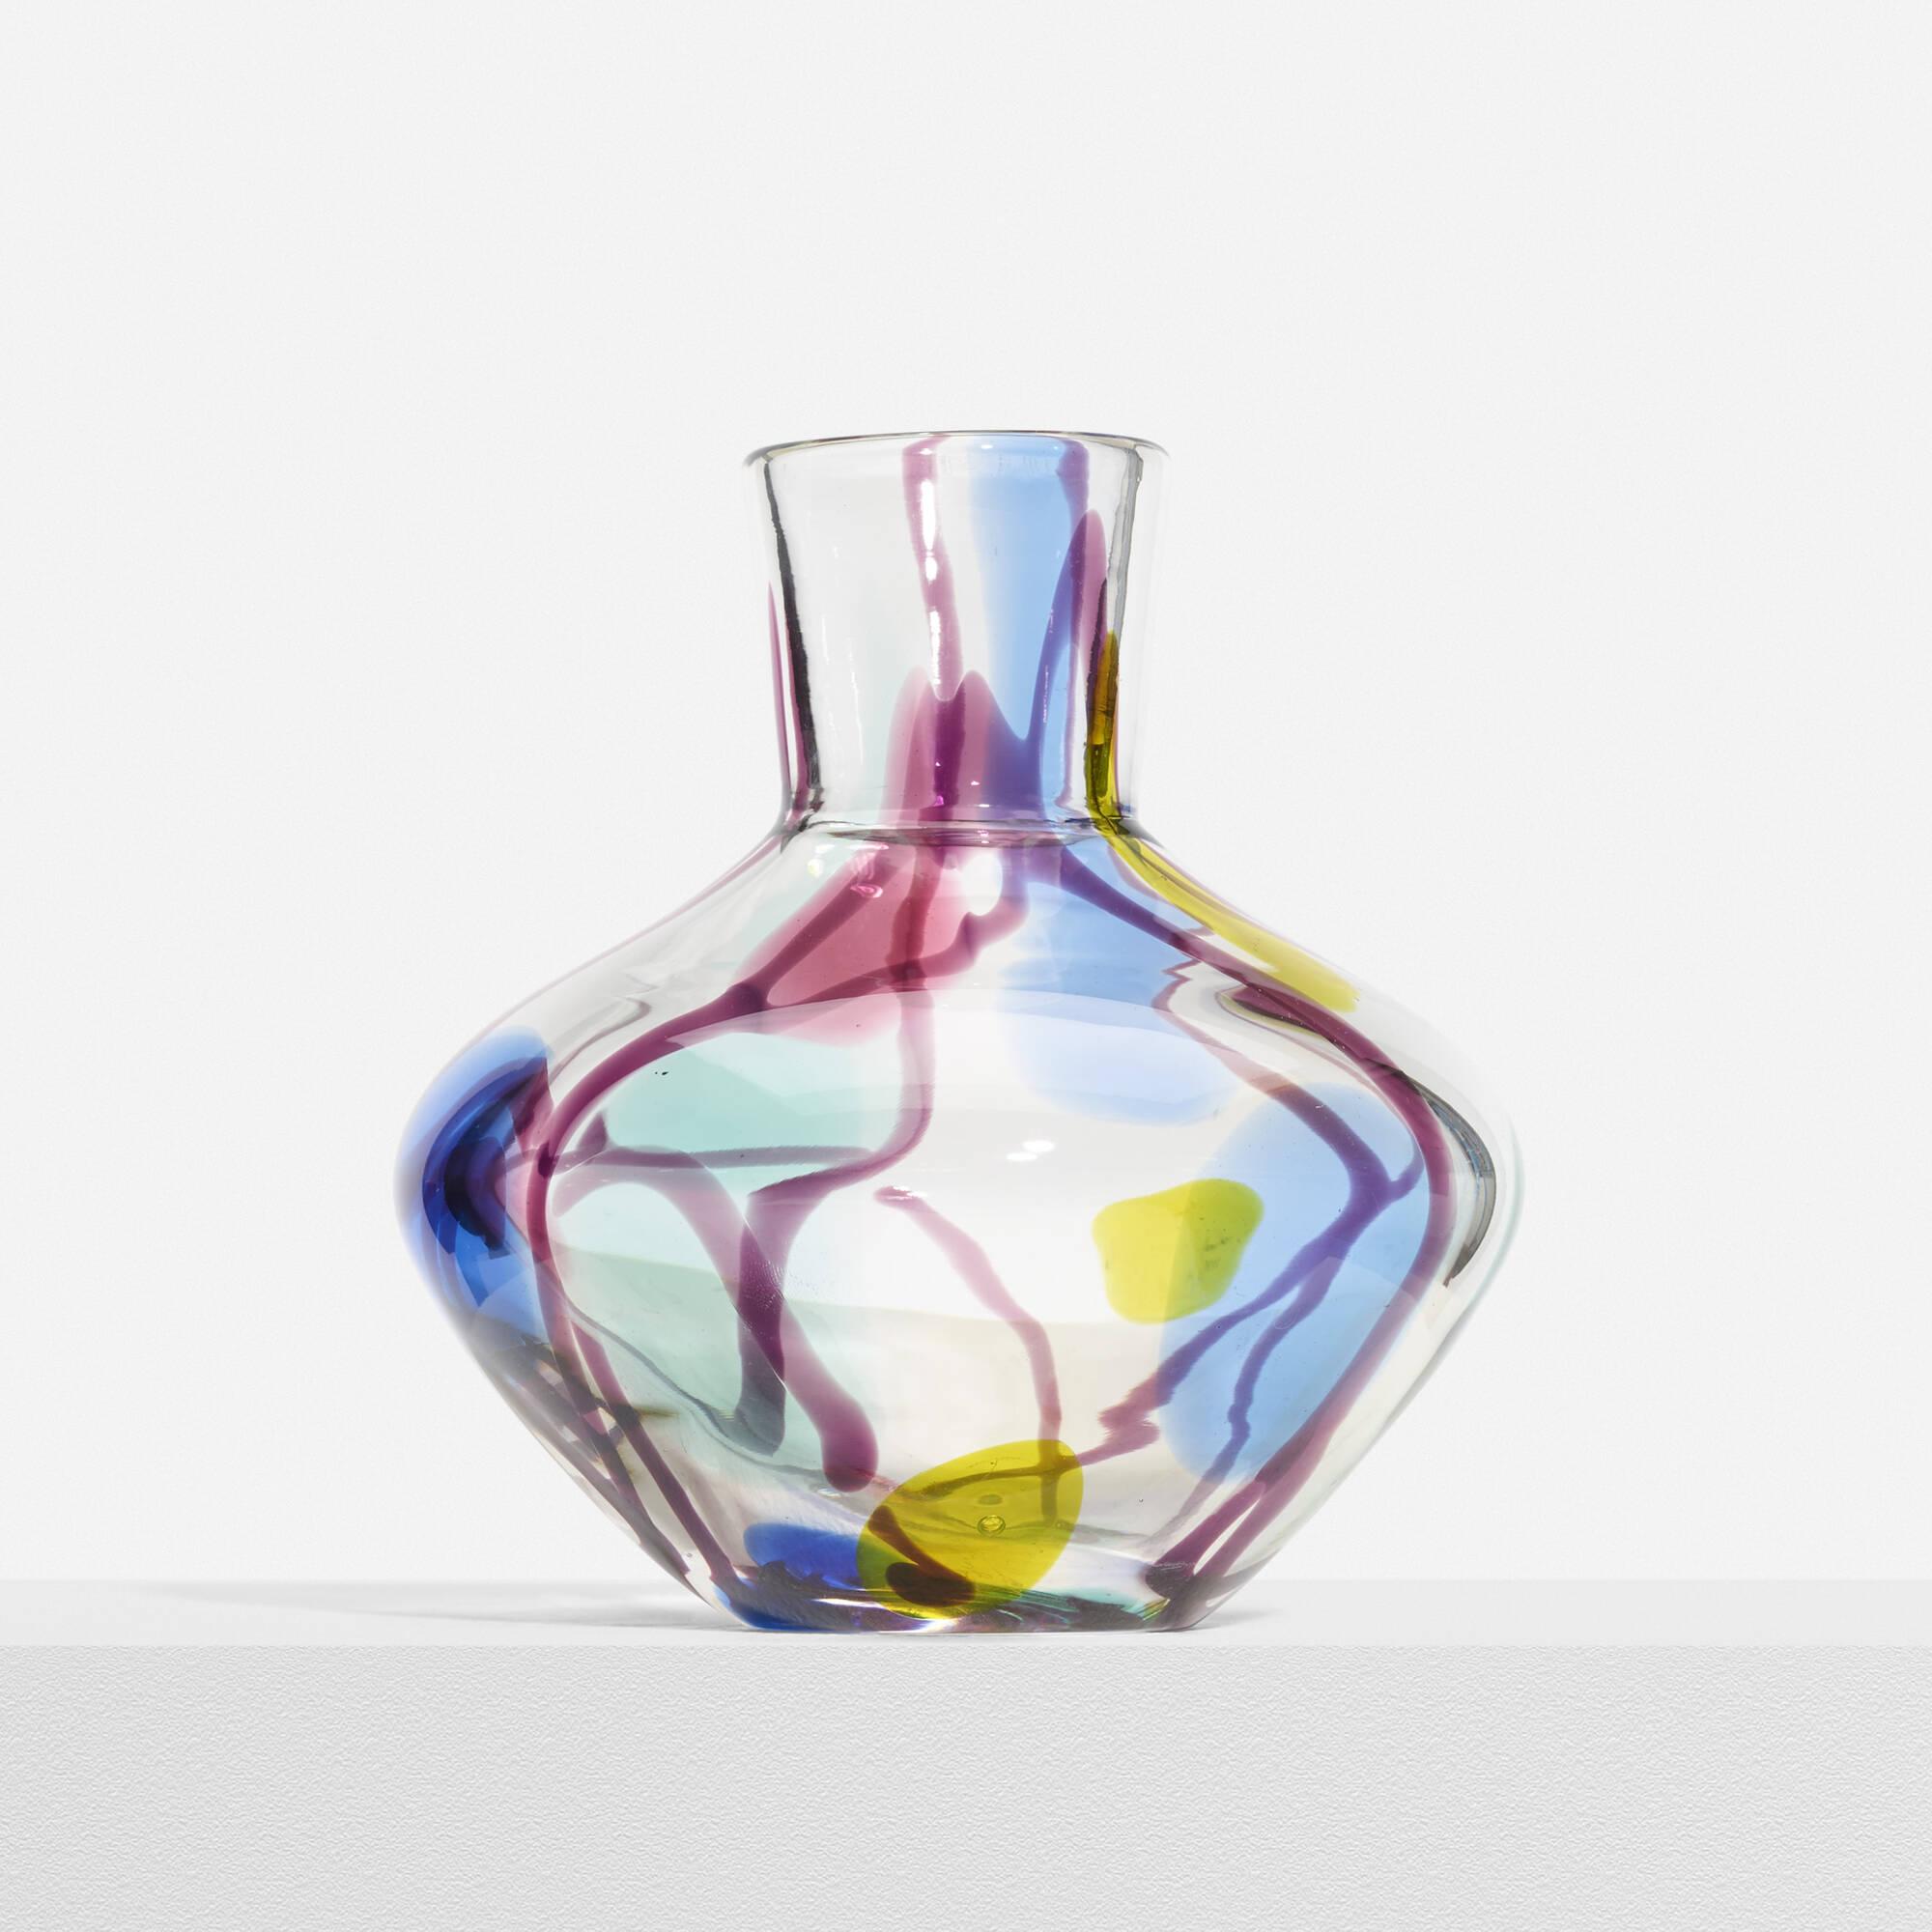 245: Archimede Seguso / vase (1 of 3)